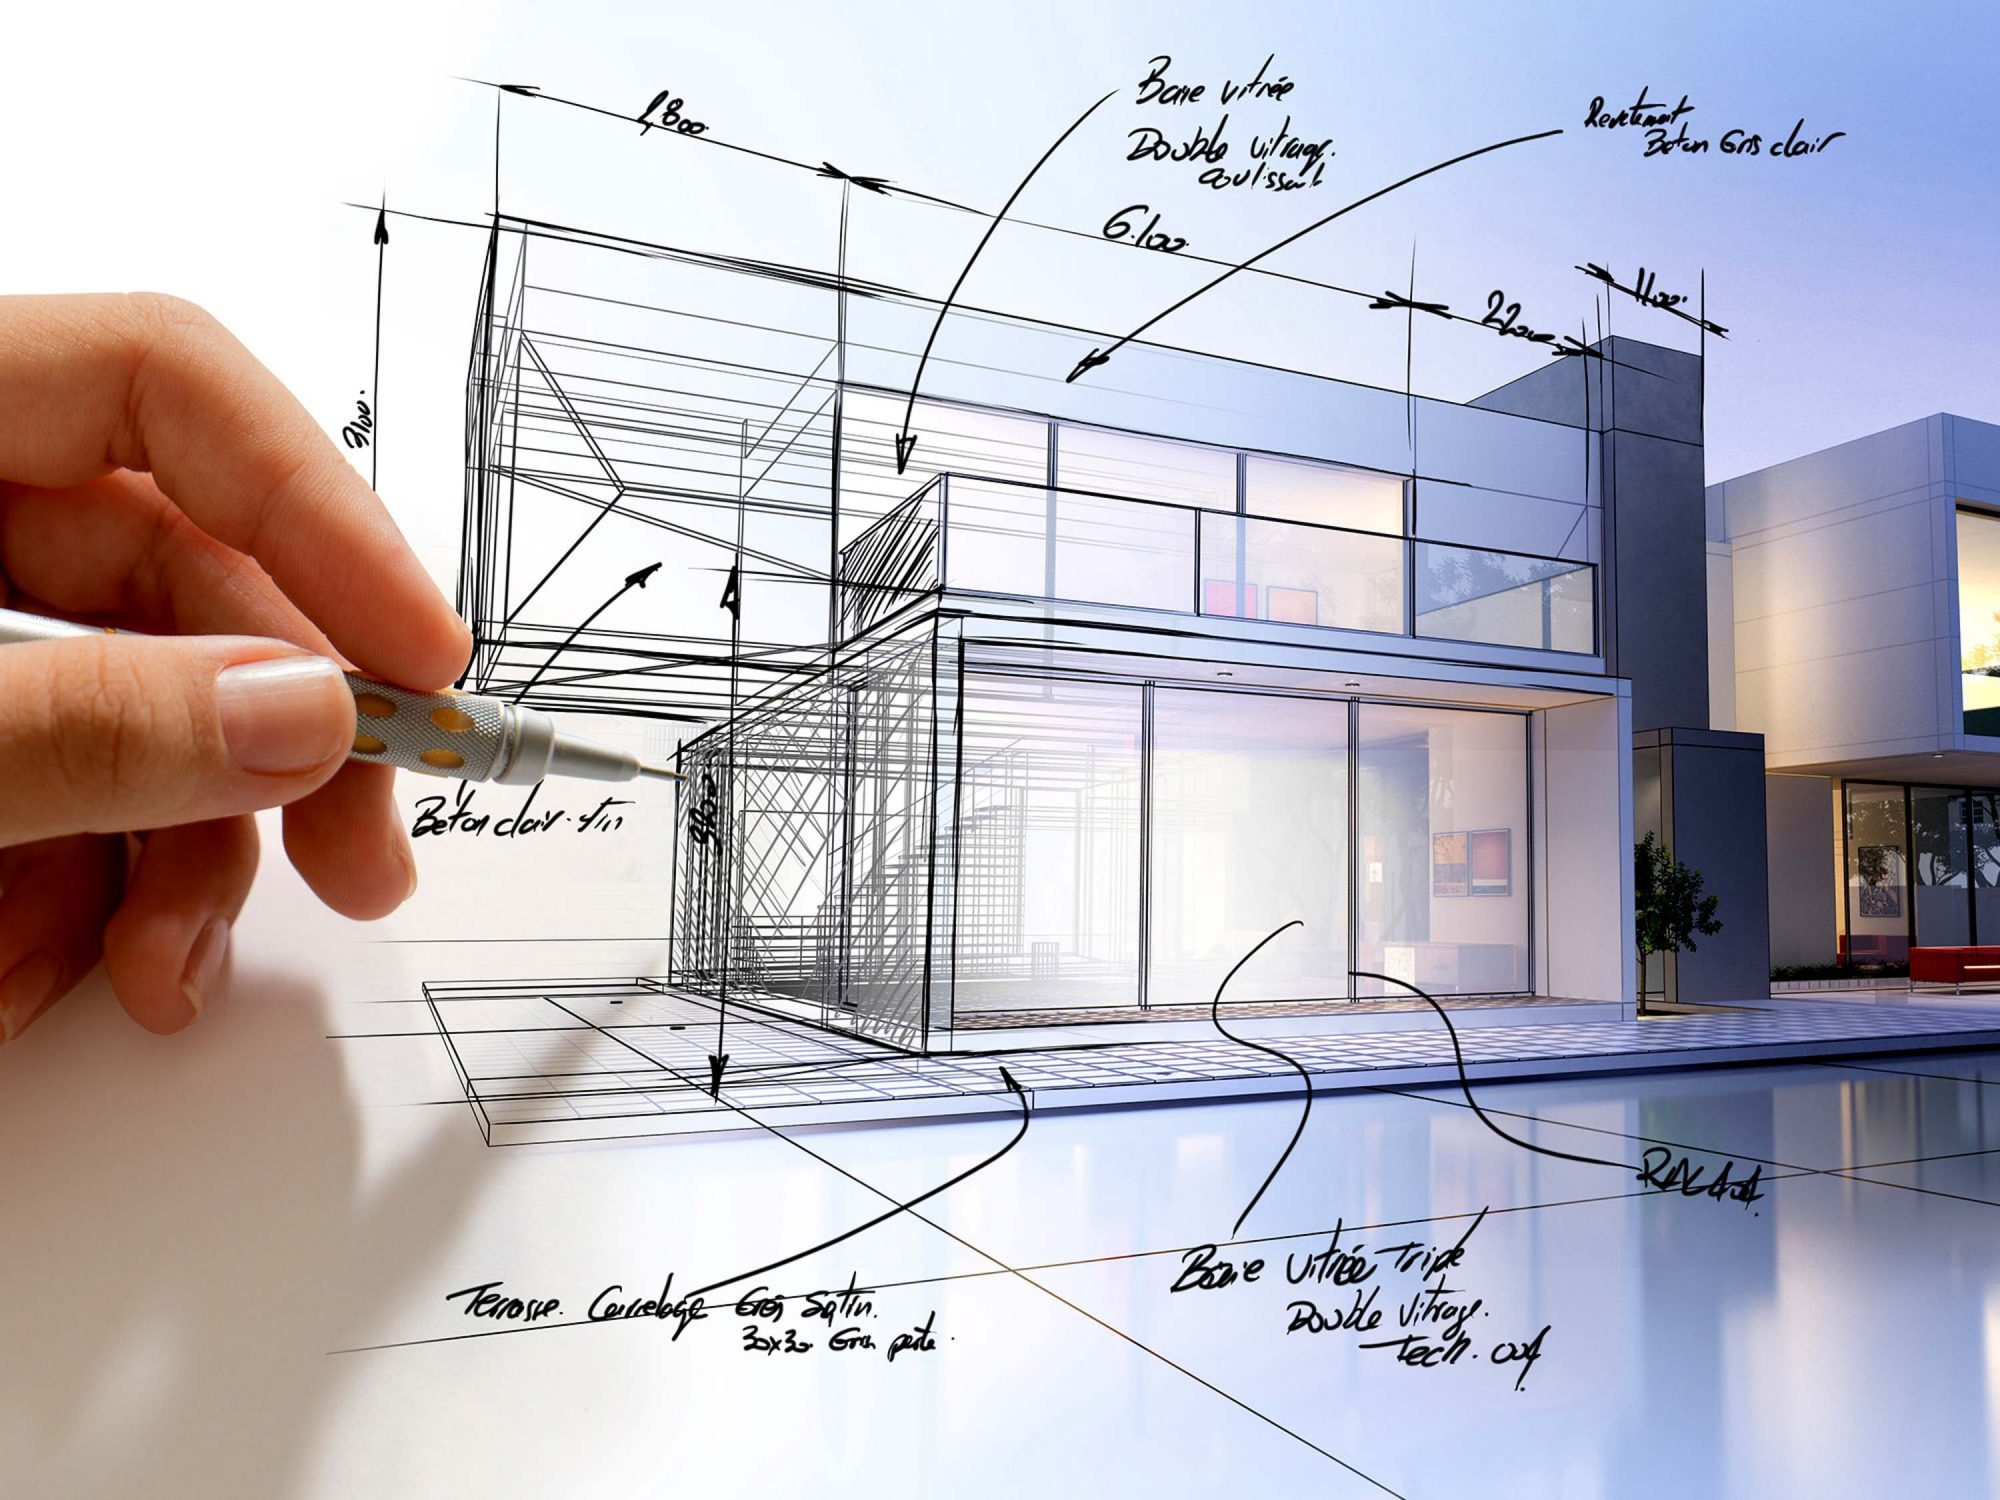 طراحی ویلا | ویلاسازی | طراحی ویلای مدرن | طراحی و ساخت ویلا